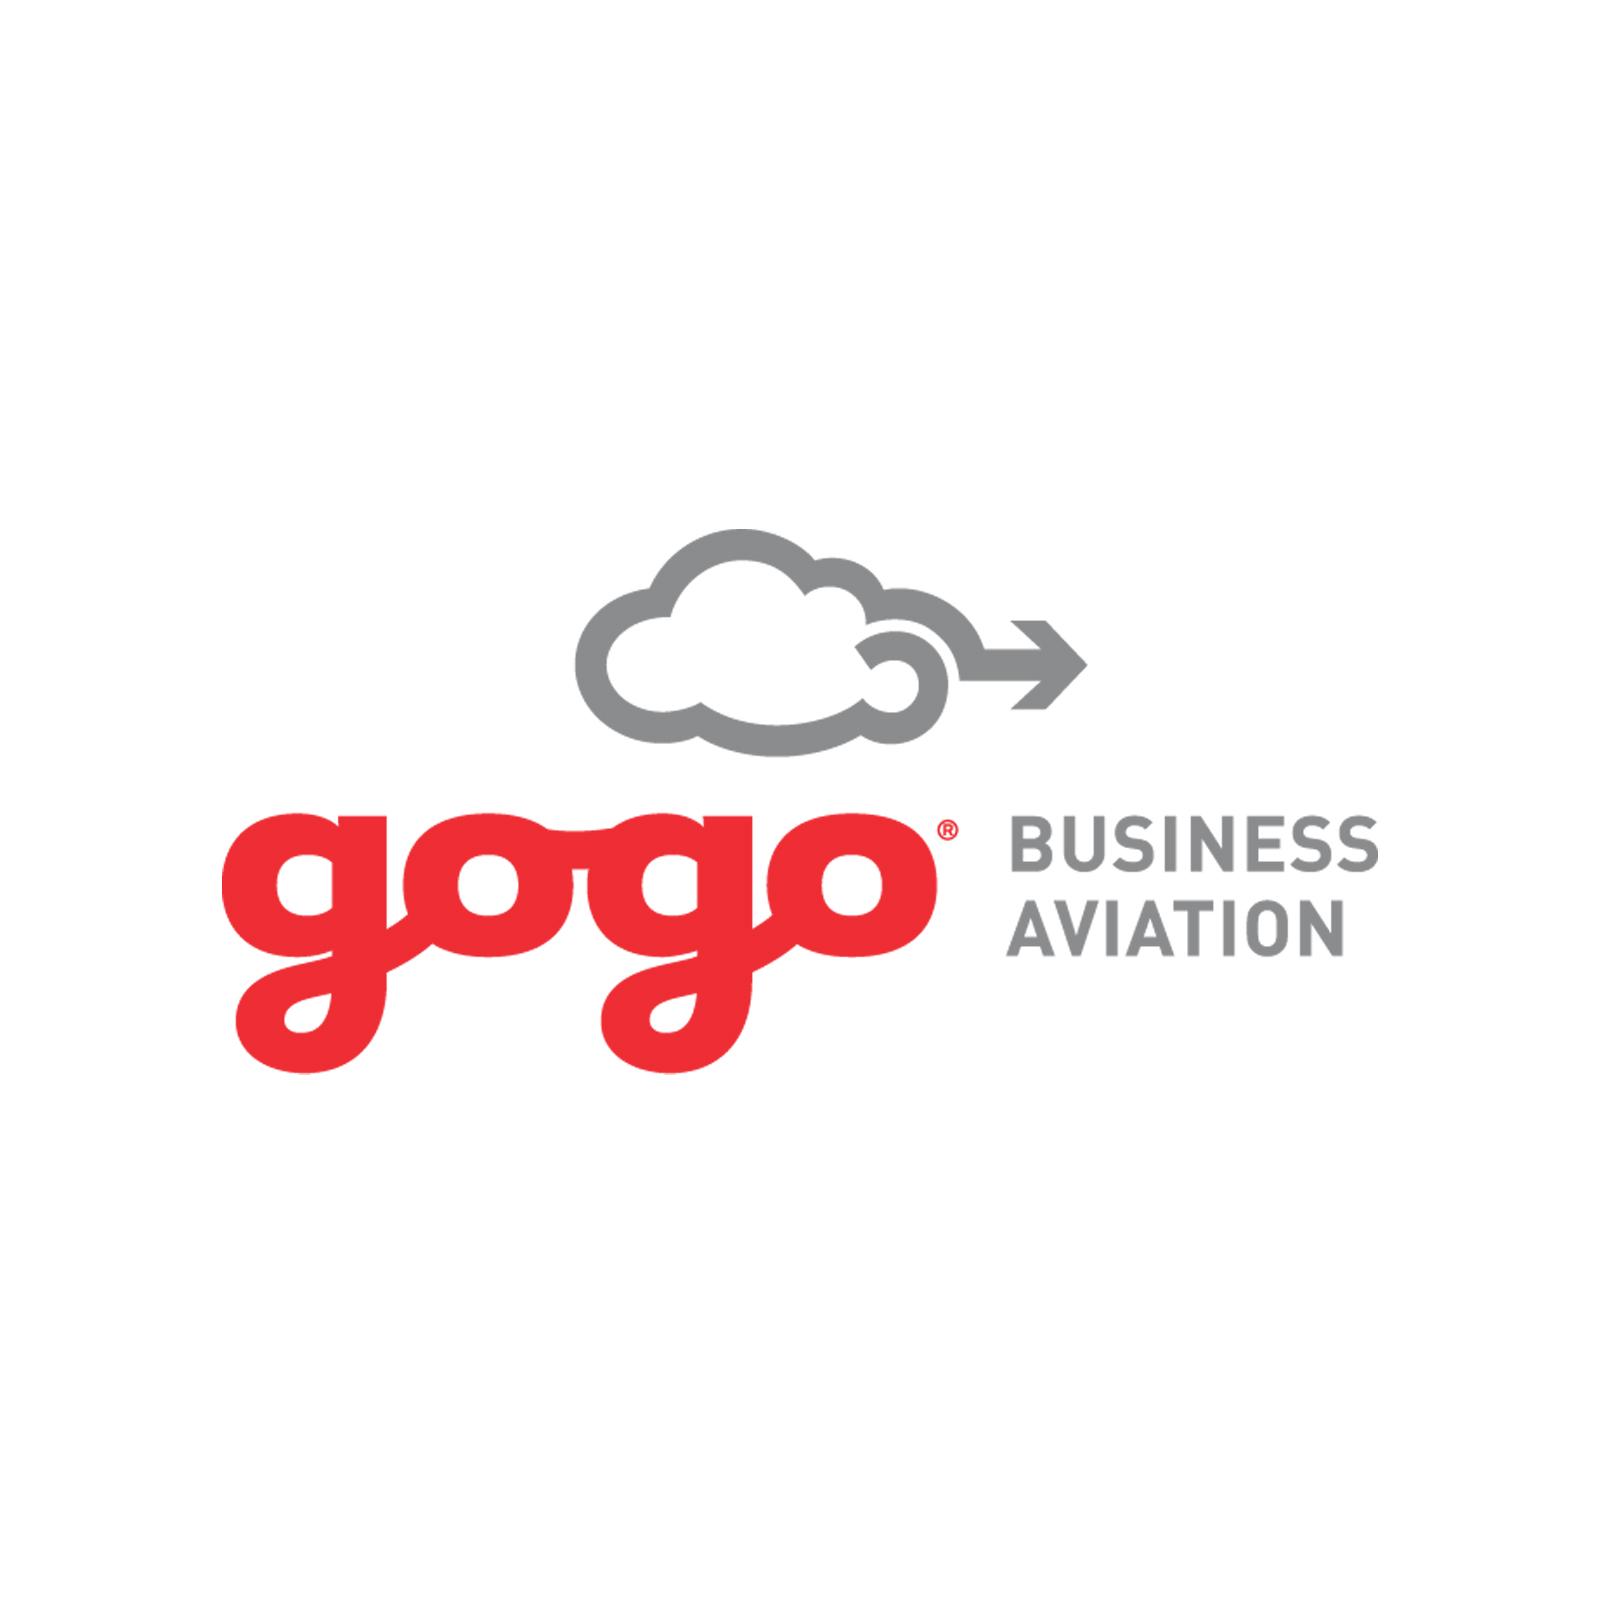 Logo gogo Business Aviation